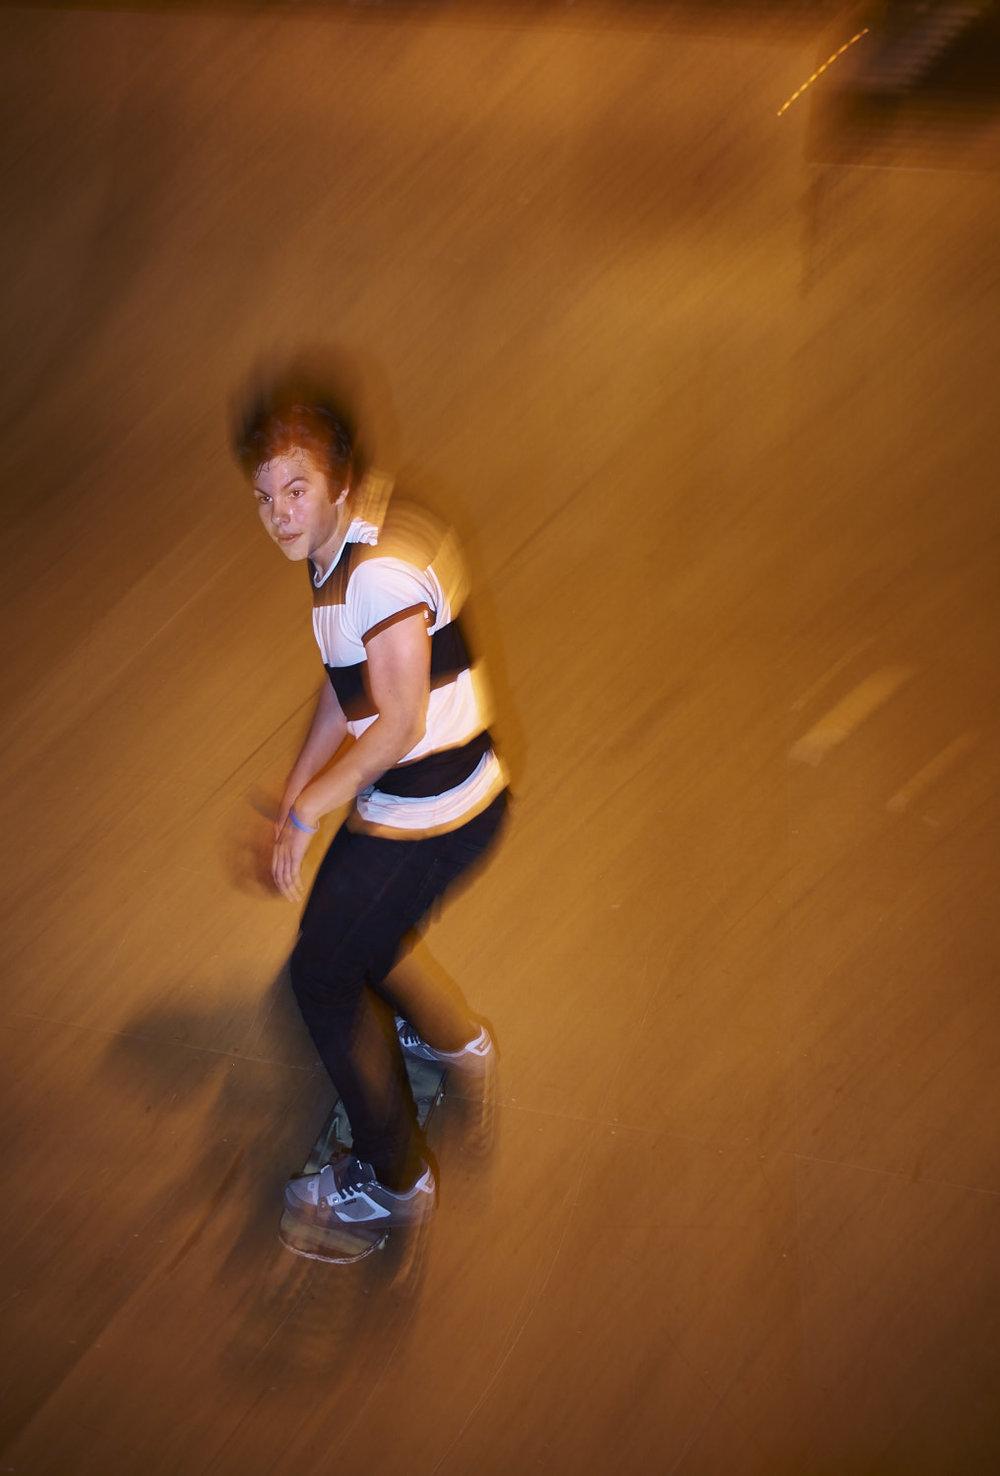 Rampworx Skatepark, Liverpool